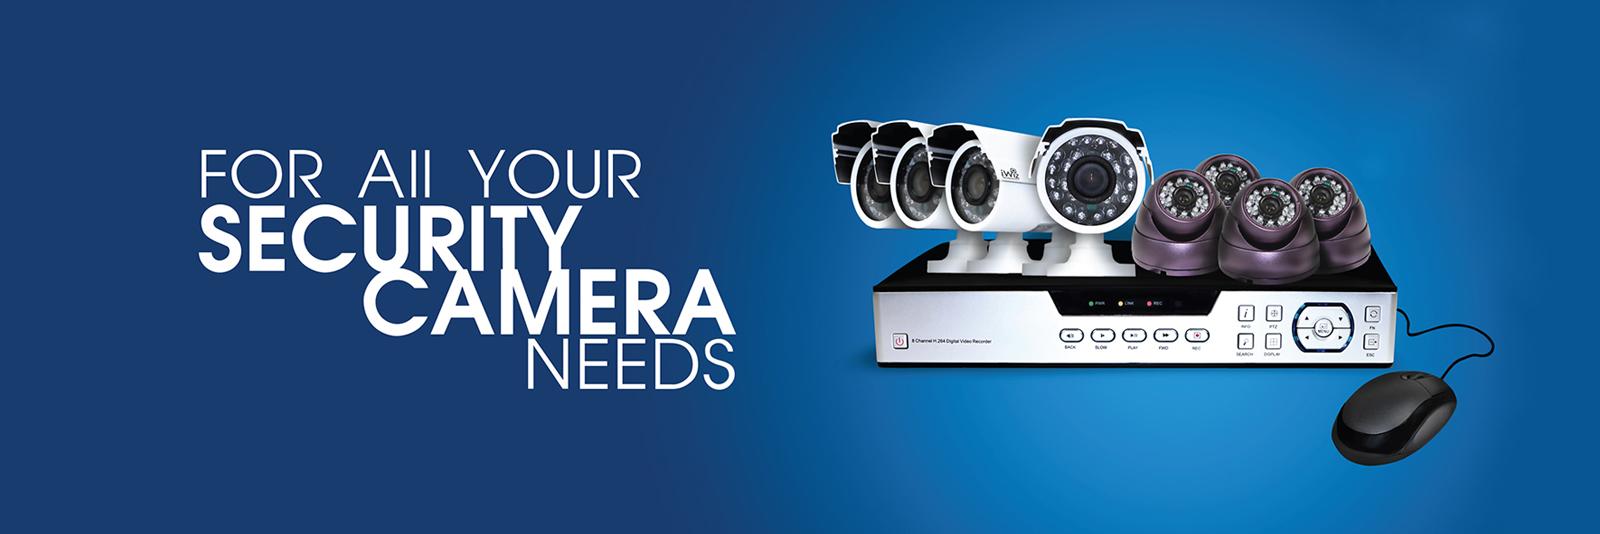 Cctv Security Camera System